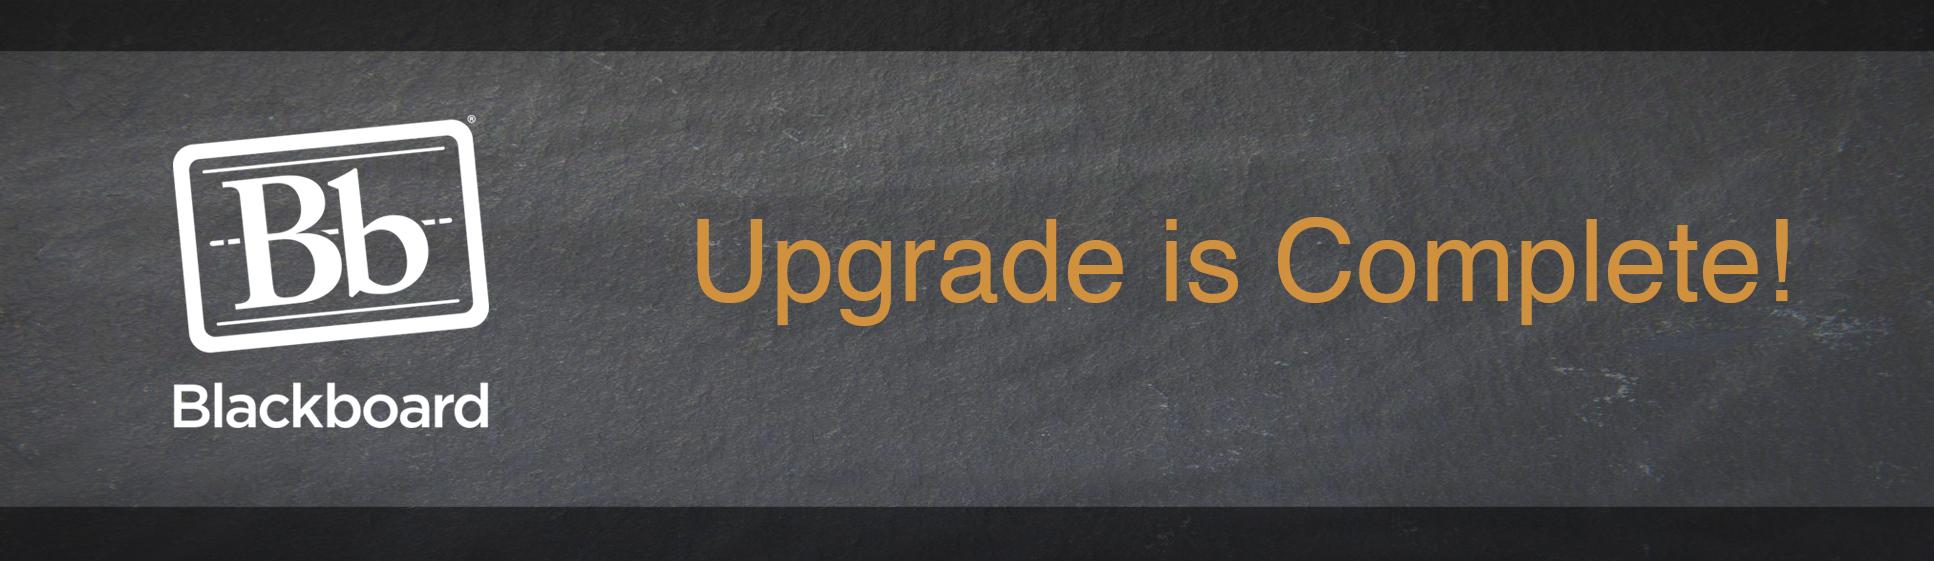 FSCJ Blackboard LMS Upgrade Complete